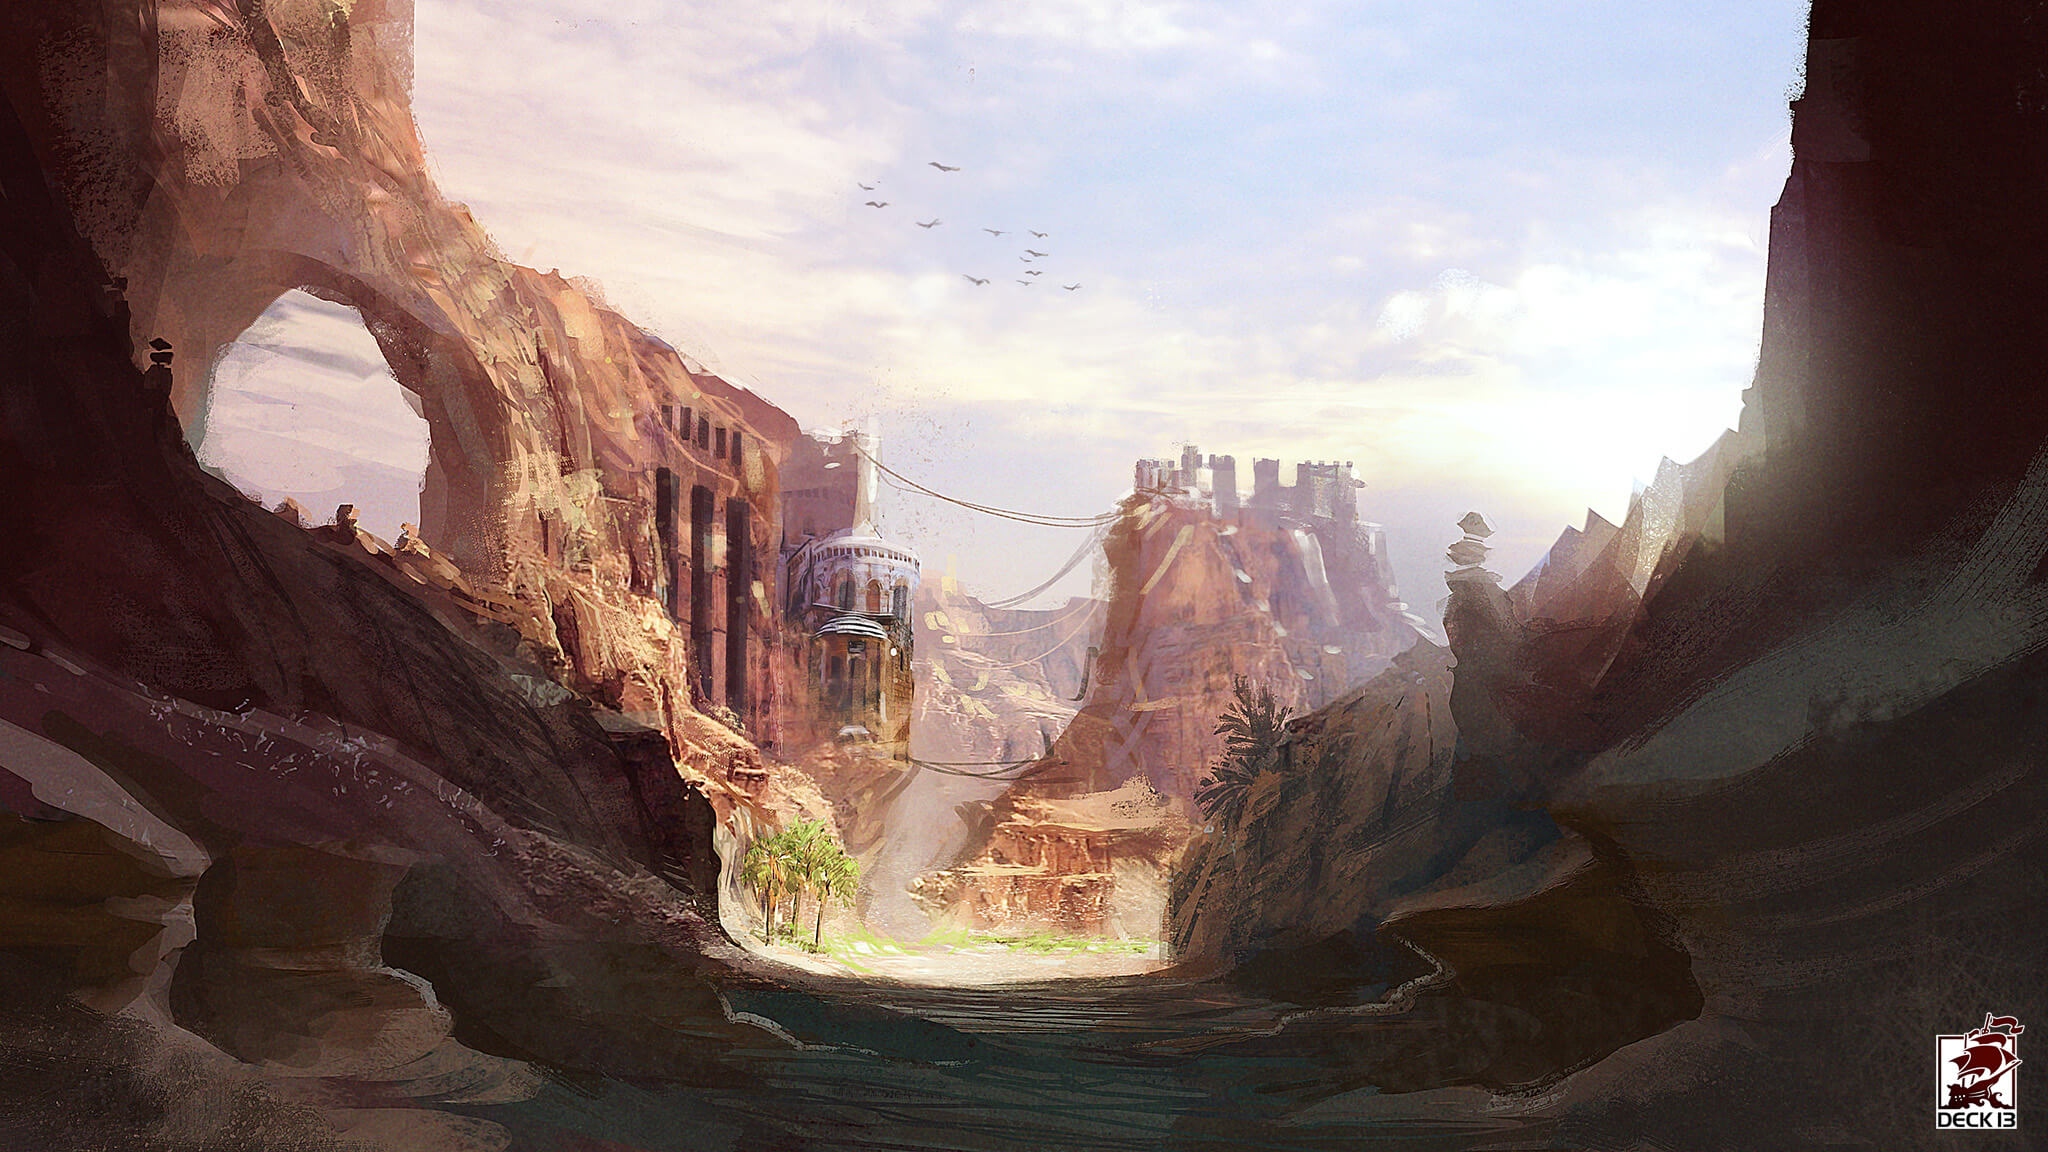 blood-knights-concept-art-felix-haas-holy-land-001